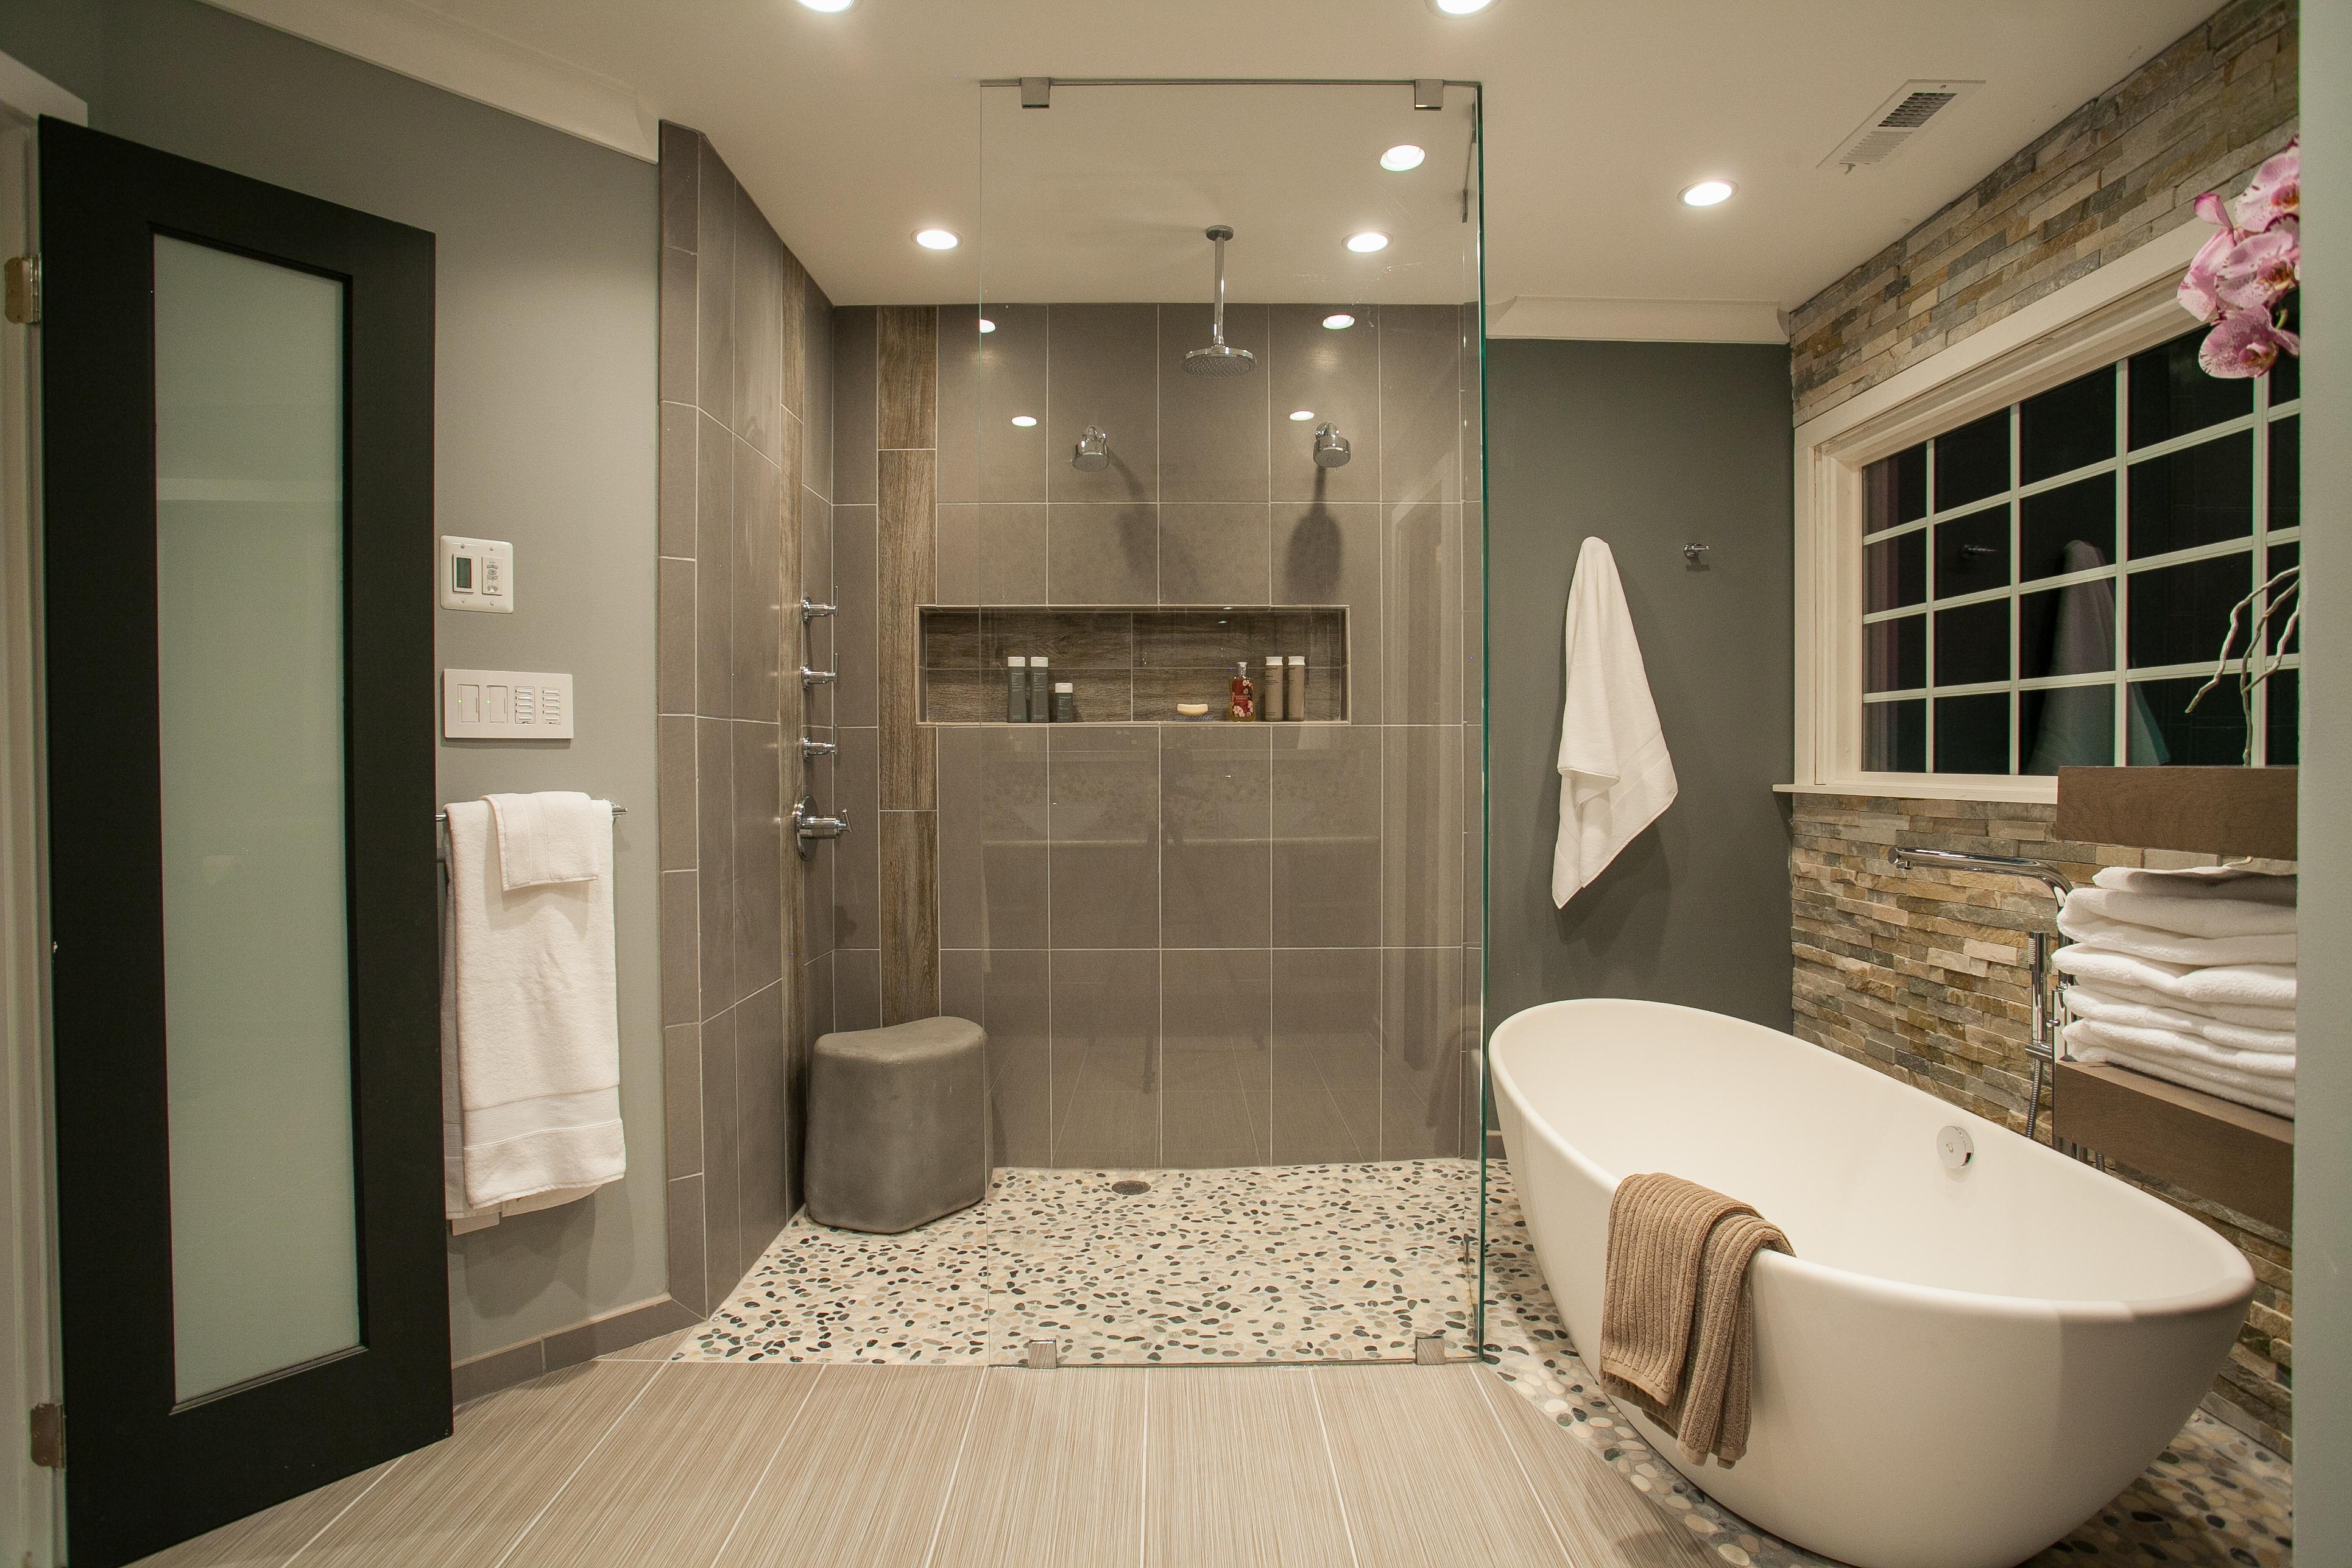 spa bathroom shower ideas photo - 9